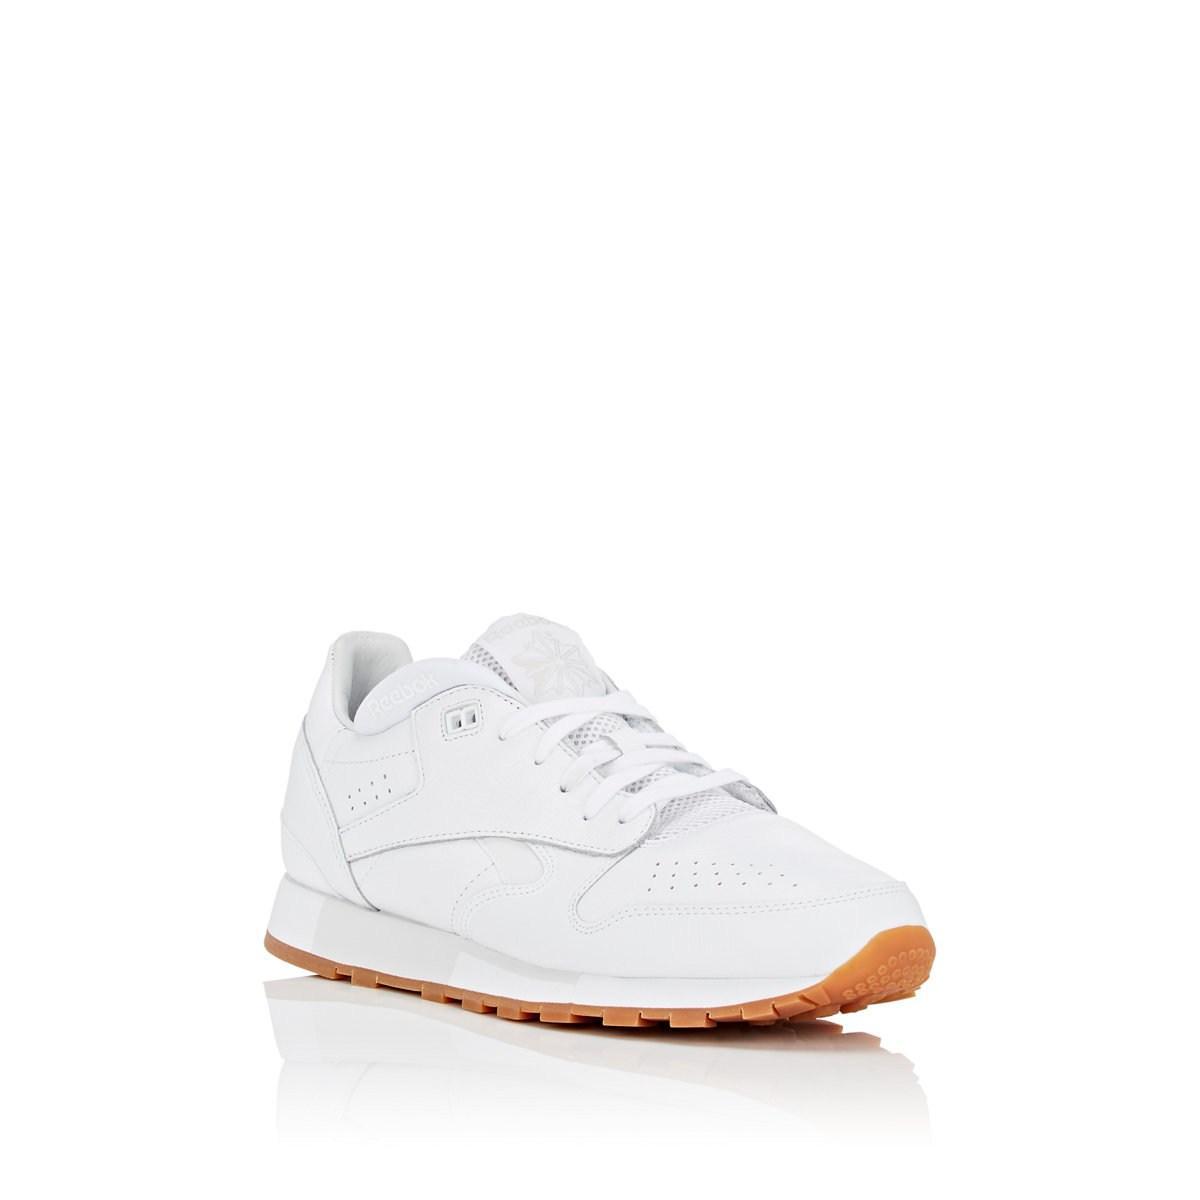 Reebok - White Urge Leather Sneakers for Men - Lyst. View fullscreen 58954043c